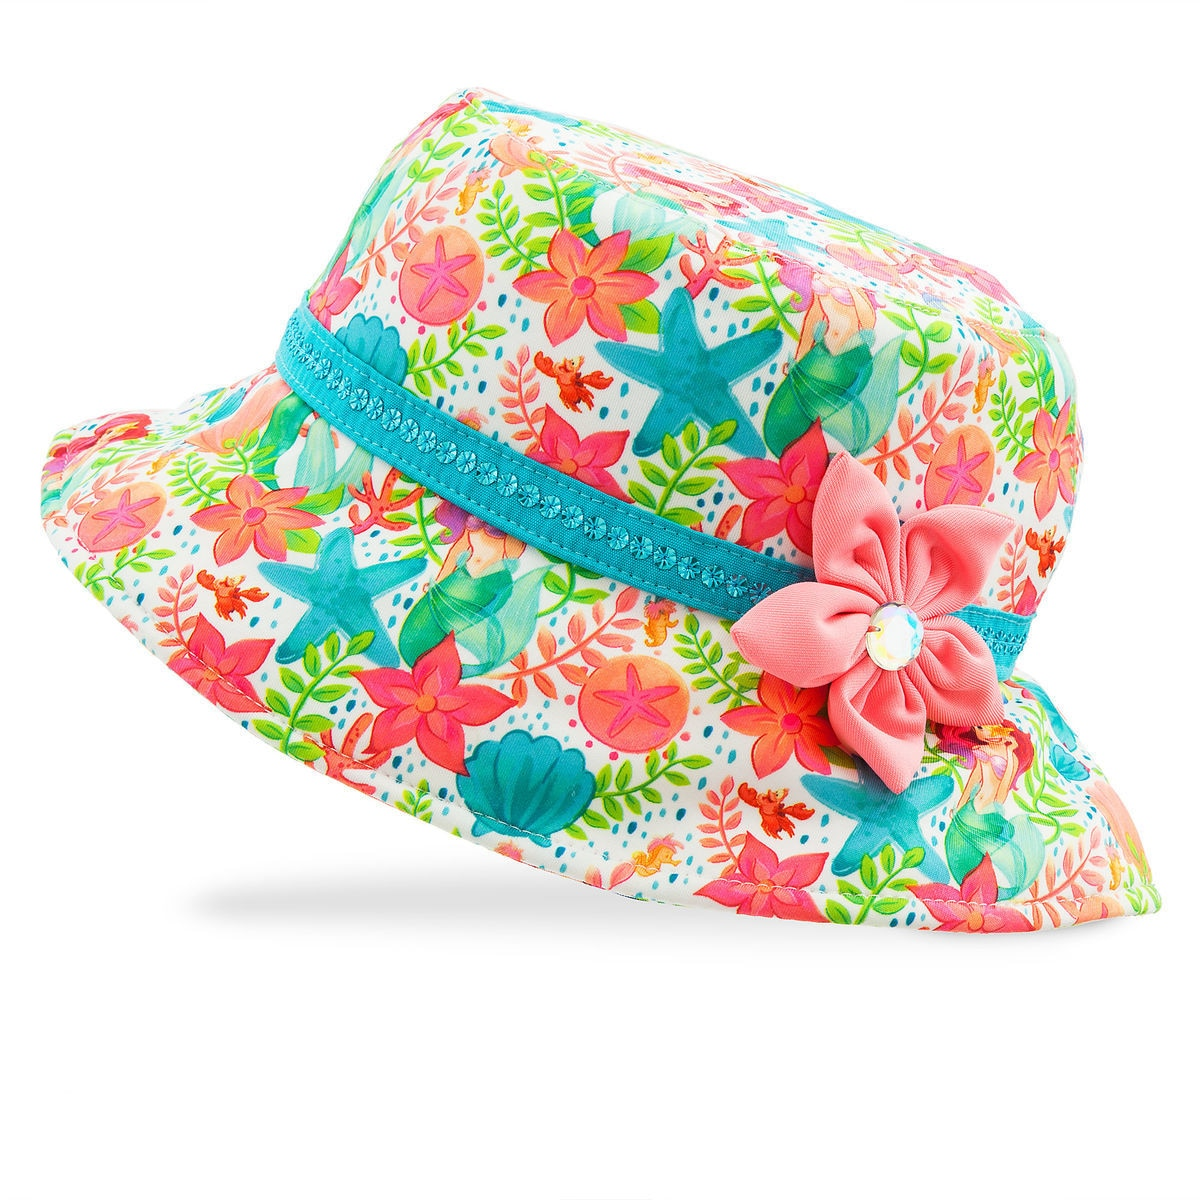 496b6b3e7e6 Product Image of Ariel Swim Hat for Kids   1